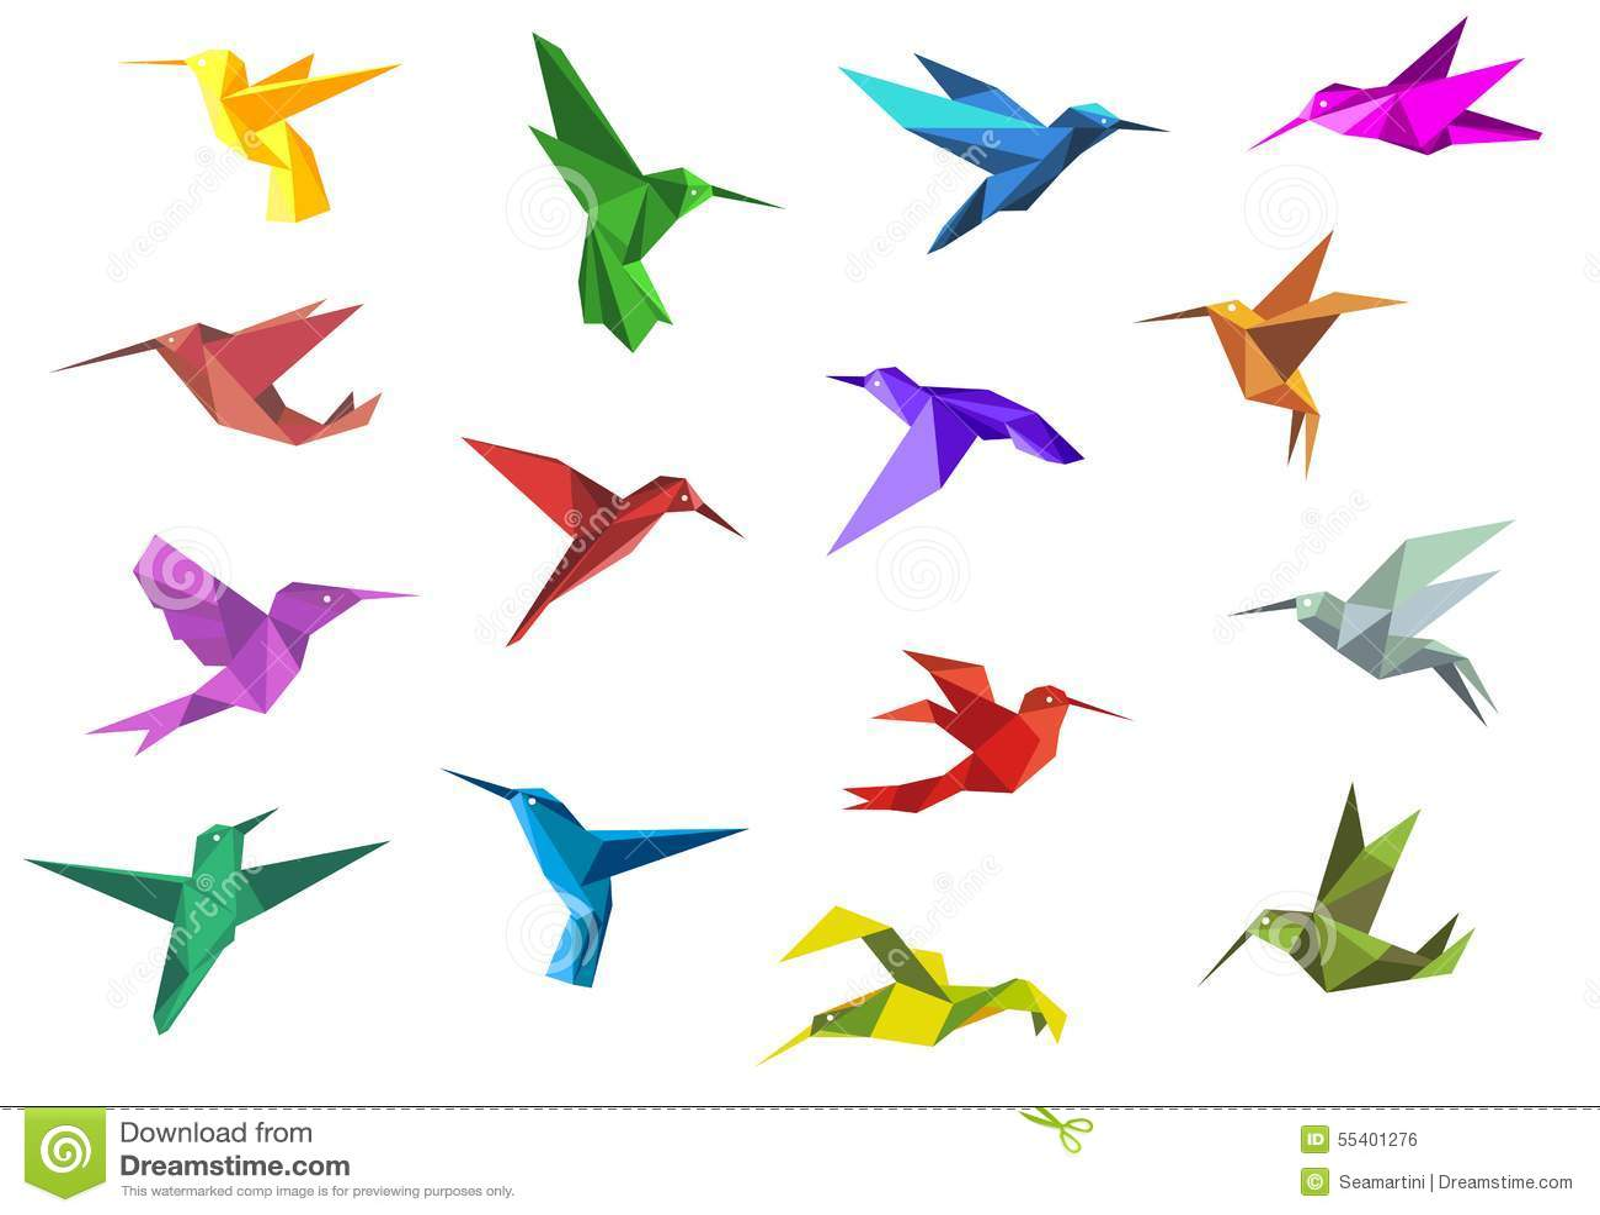 Flying Origami Hummingbirds Or Colibri Birds Stock Vector